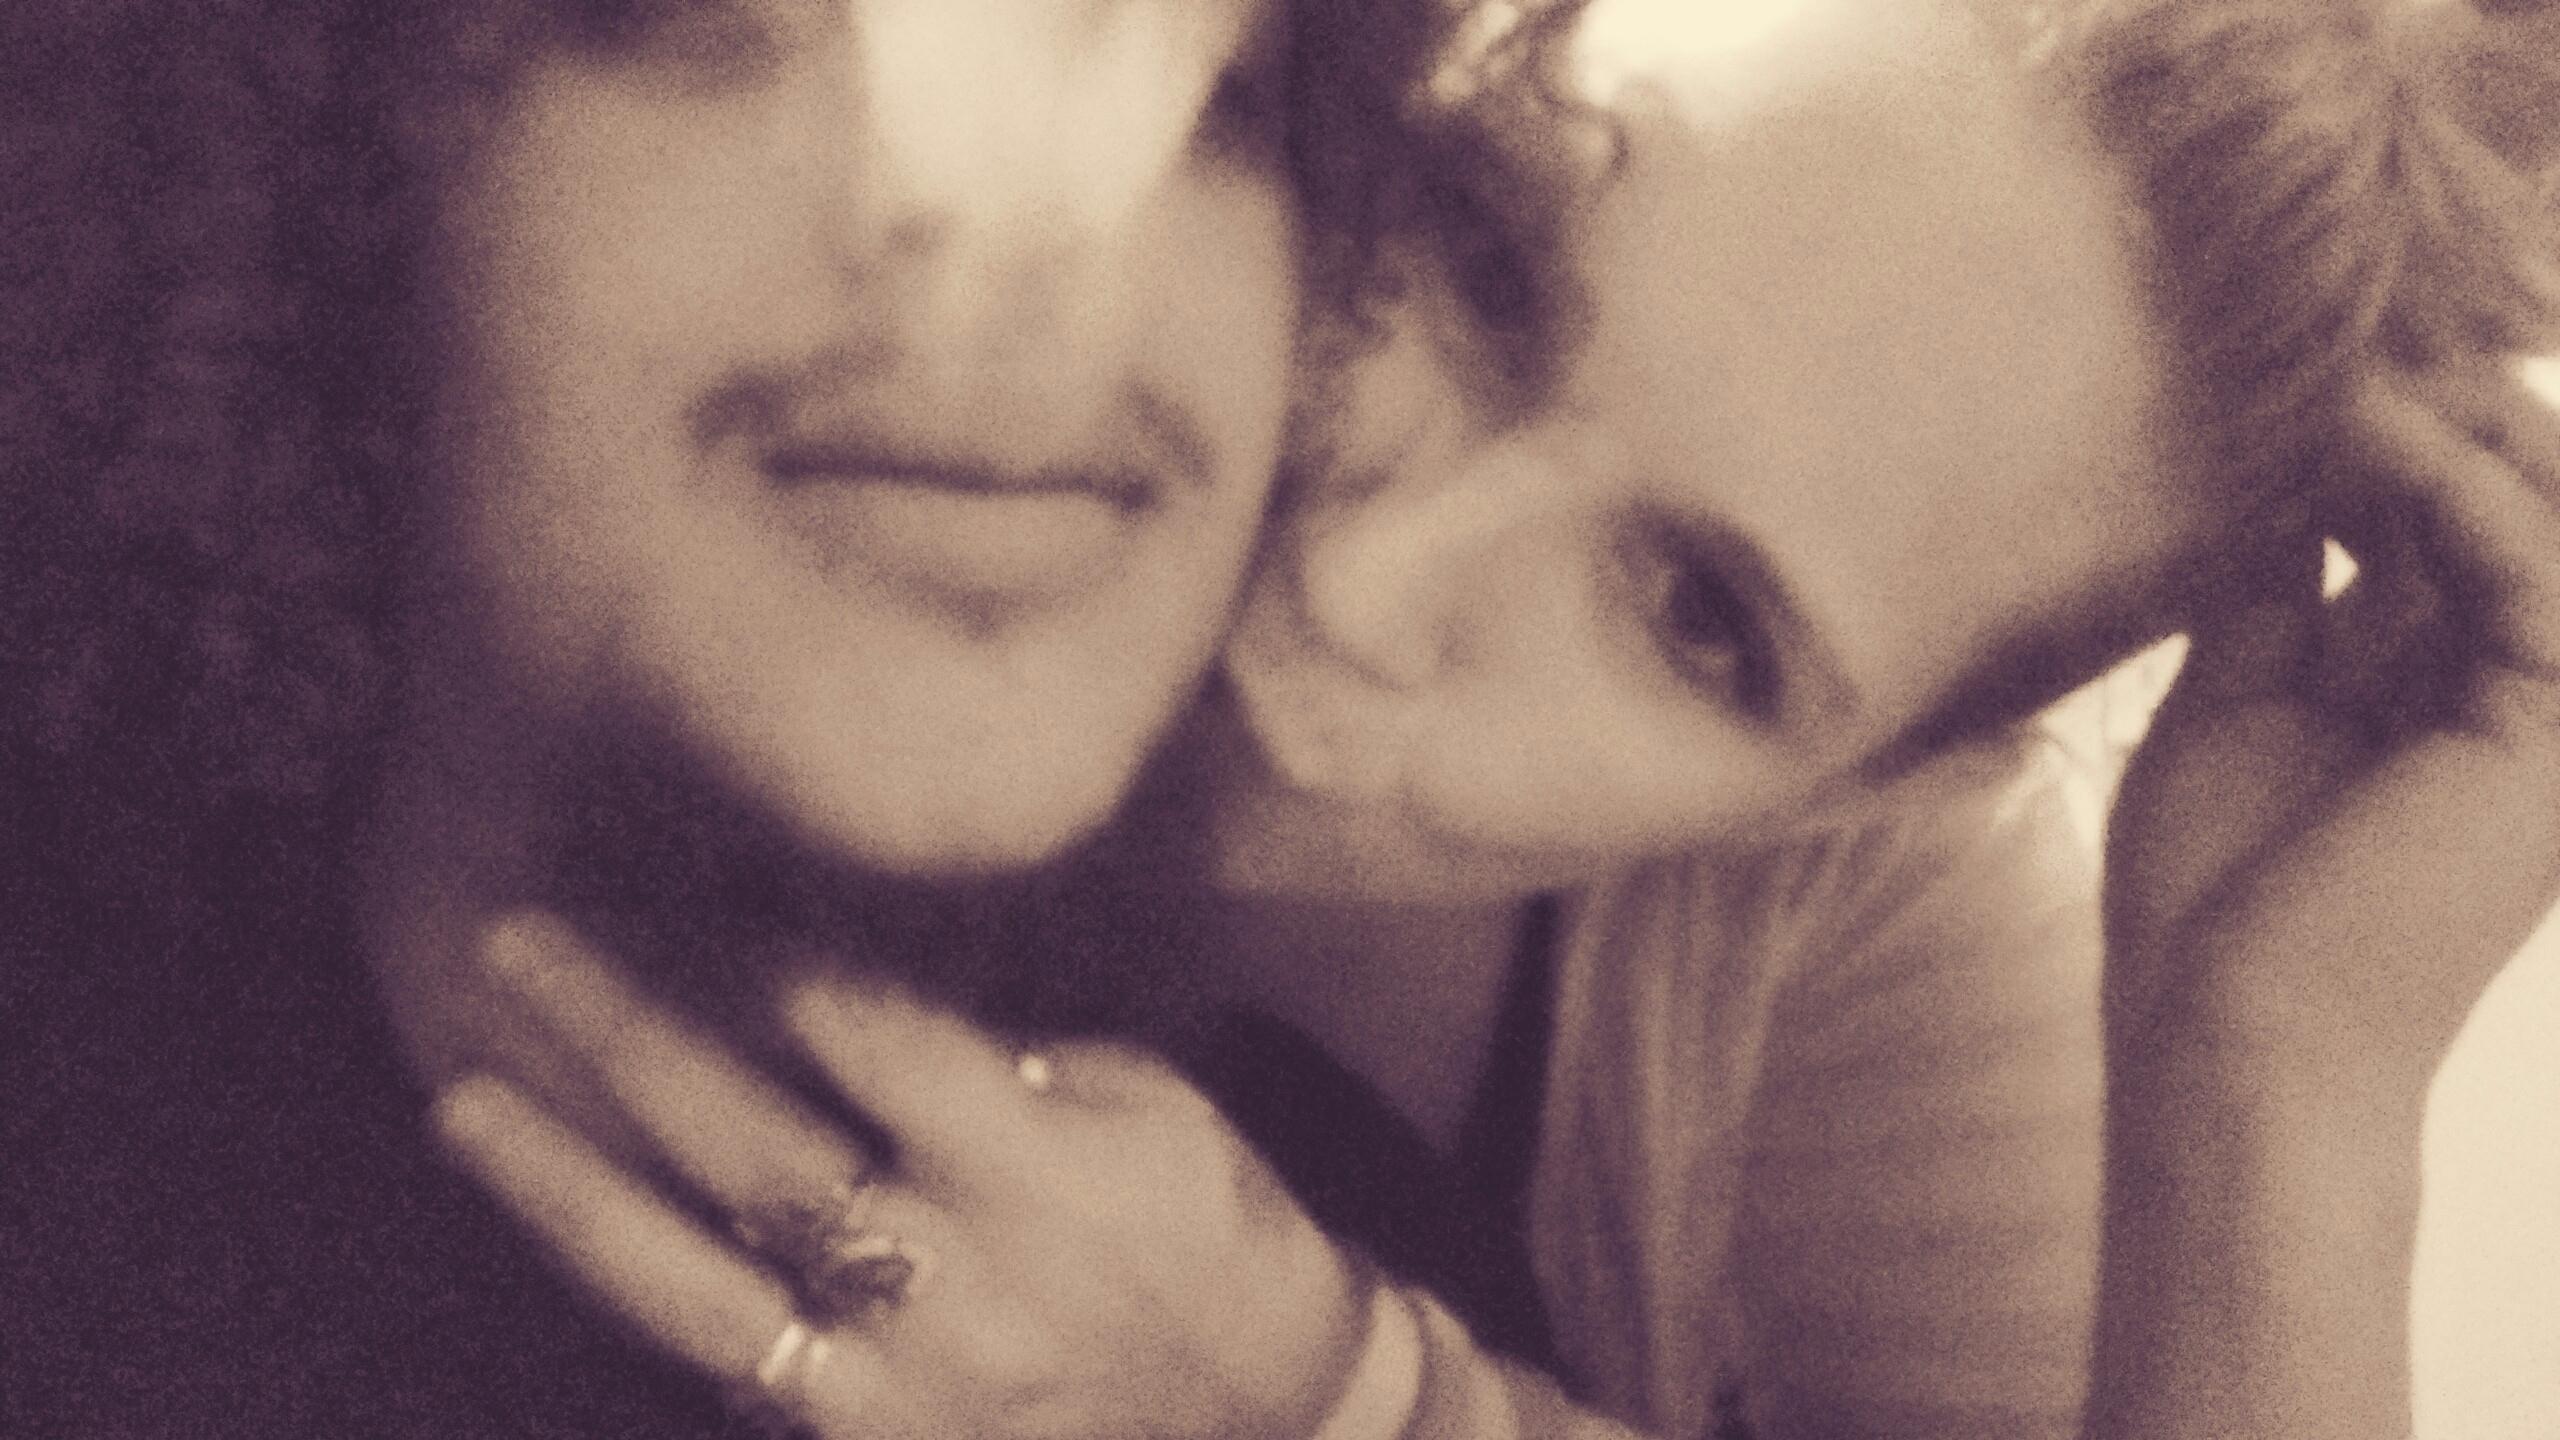 Kiss clouds - smoke, weed, vapor - pheonfox | ello